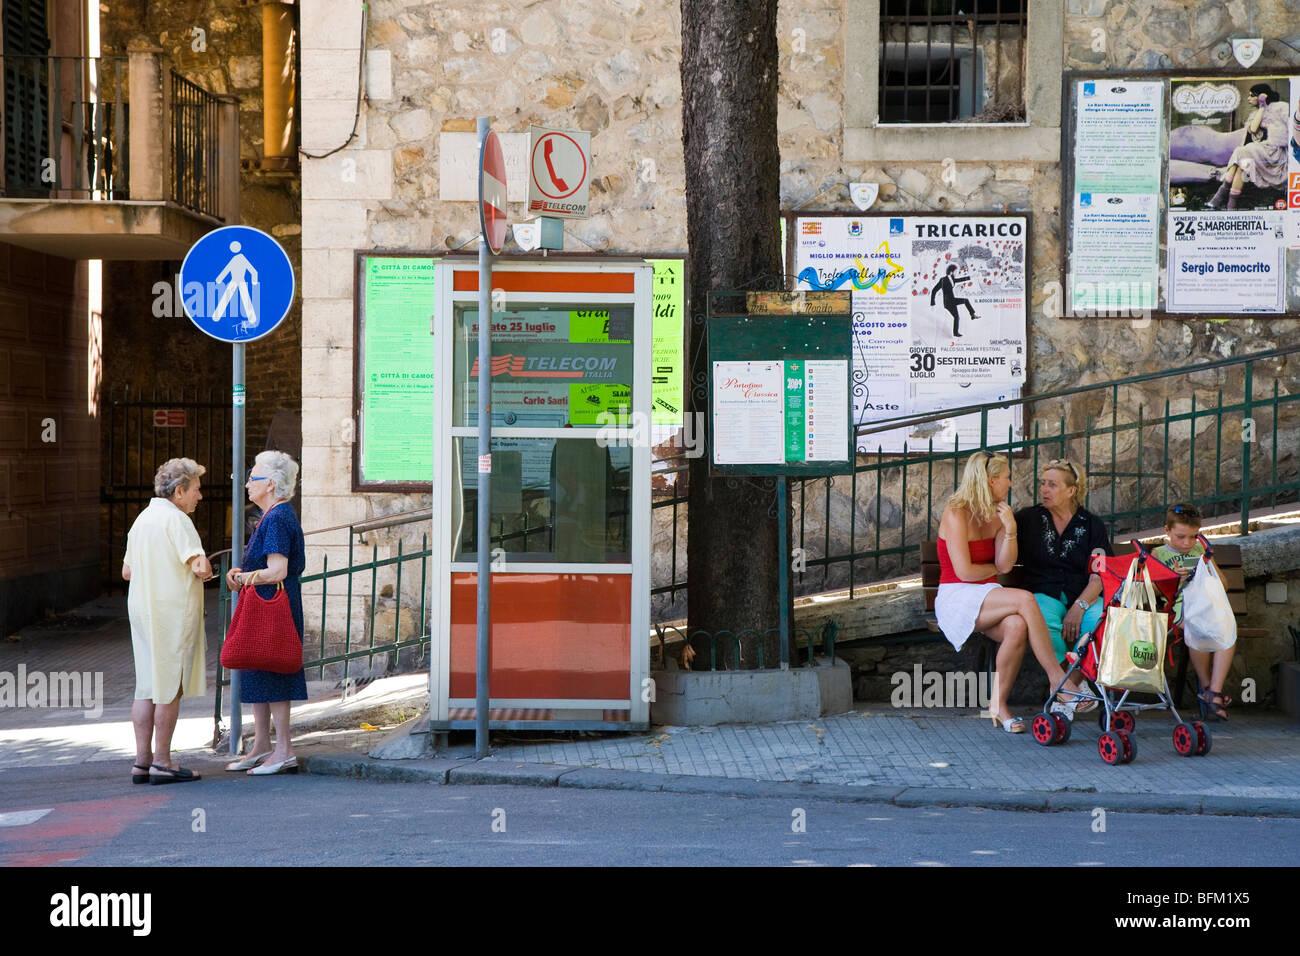 People socialising in Camogli, Liguria, Italy - Stock Image